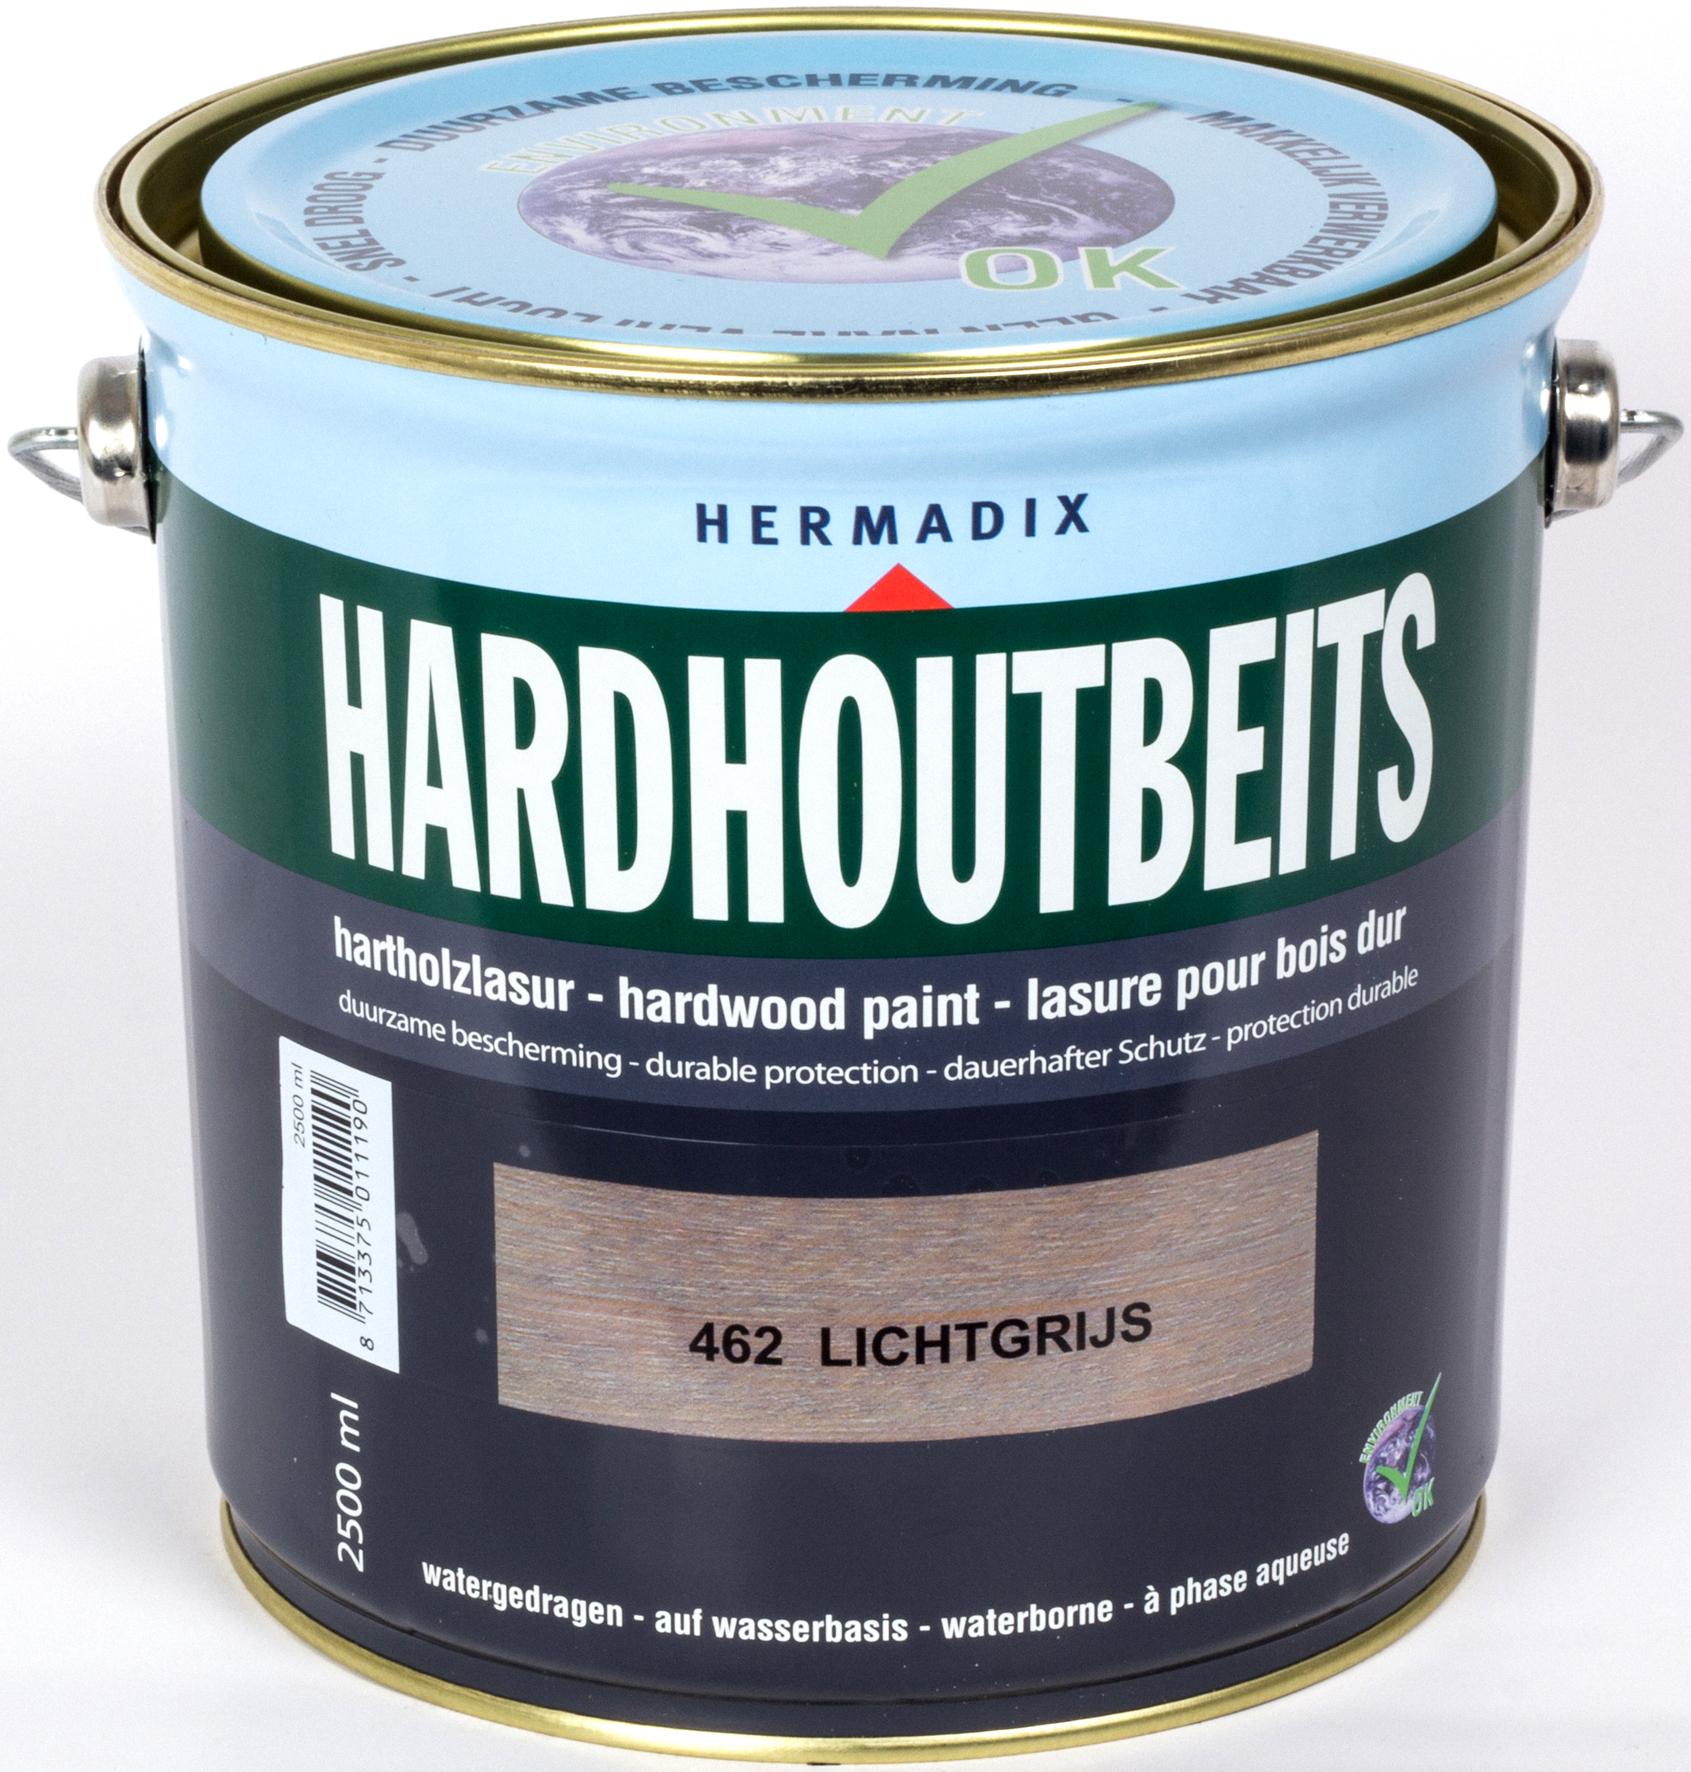 Hermadix | Hardhoutbeits 462 Licht Grijs | 750 ml